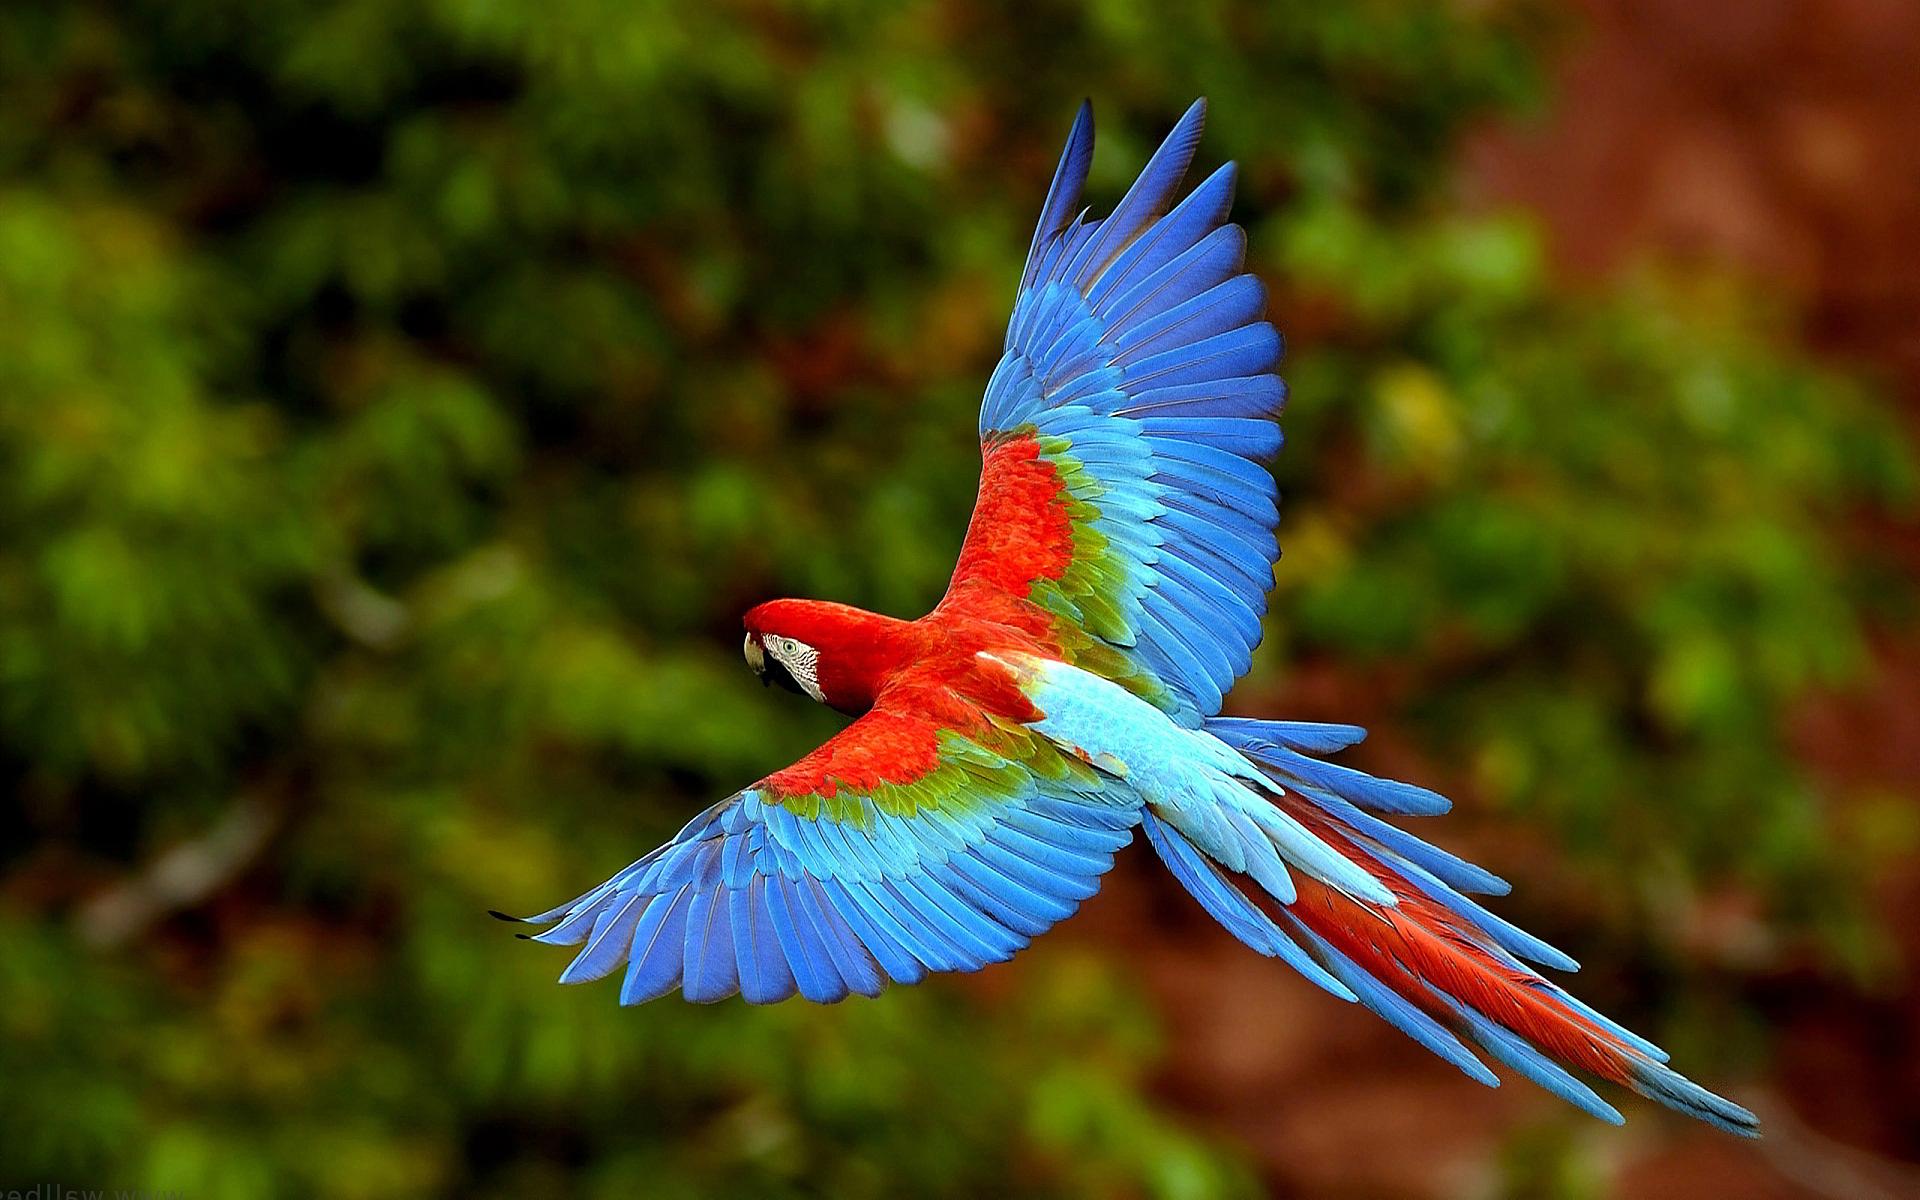 flying parrot wallpaper